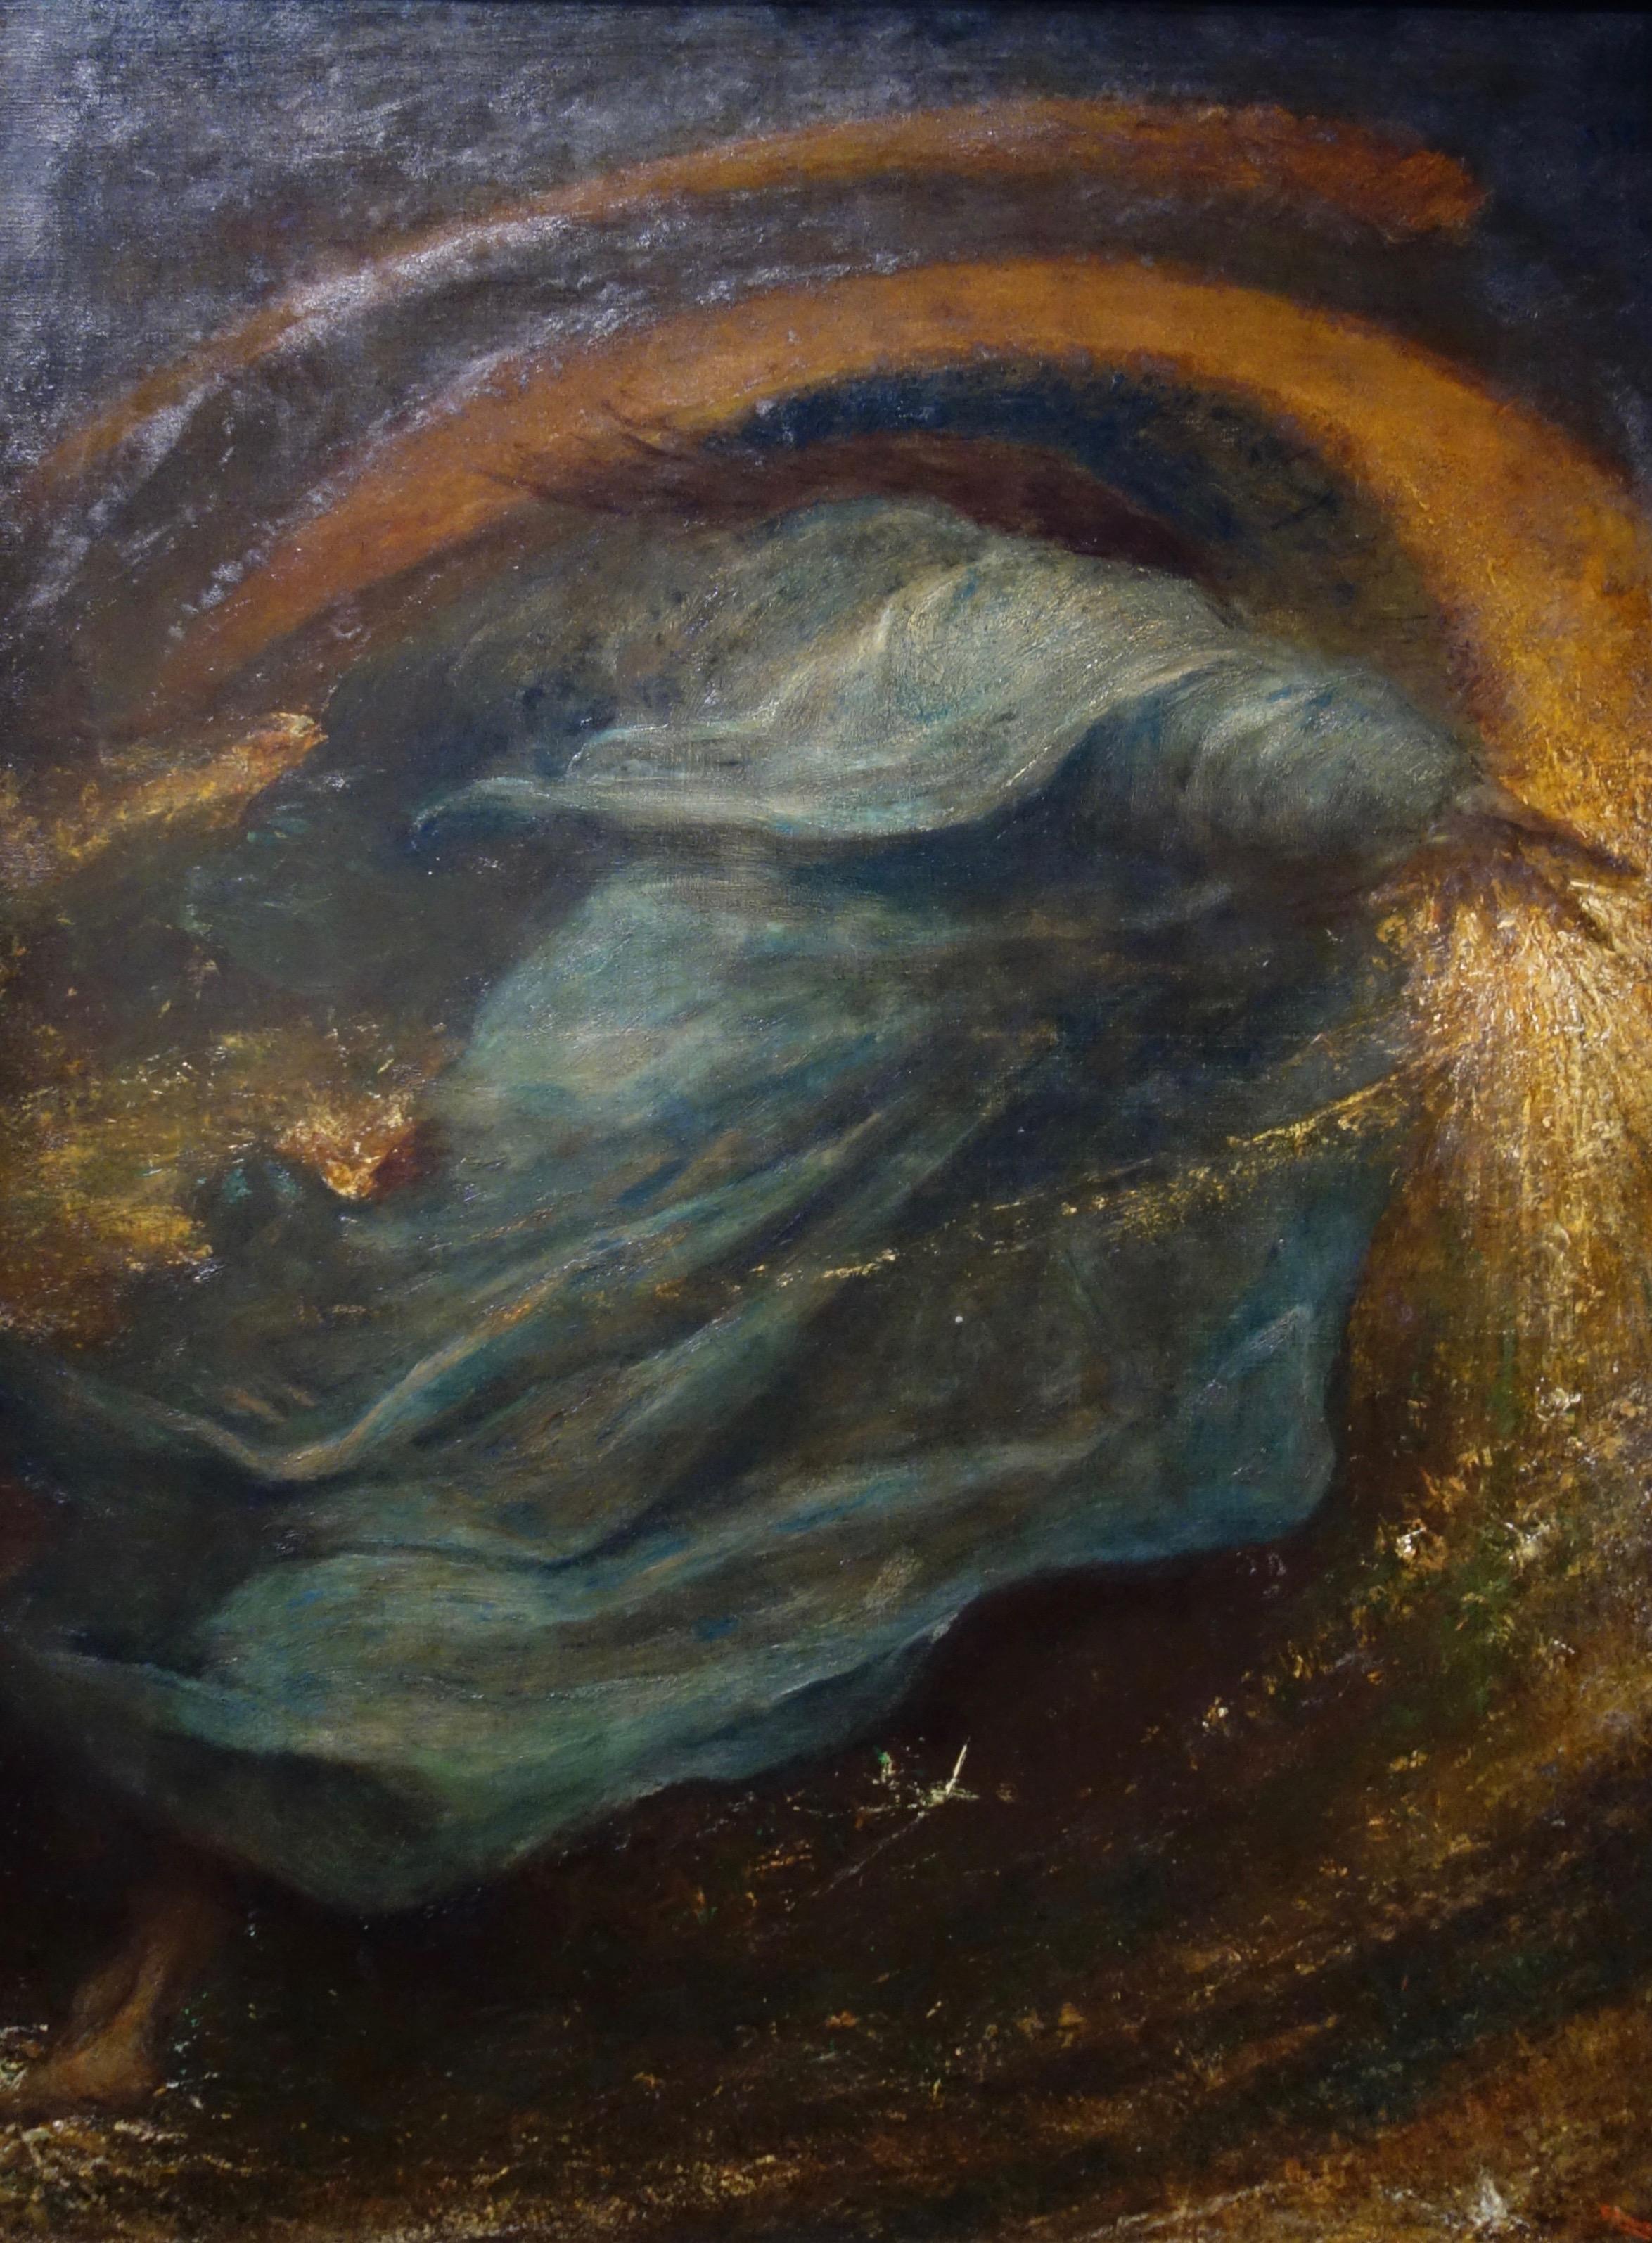 Georg Frederick Watts,  Le semeur d'étoiles , 1902, Watts Gallery, Compton